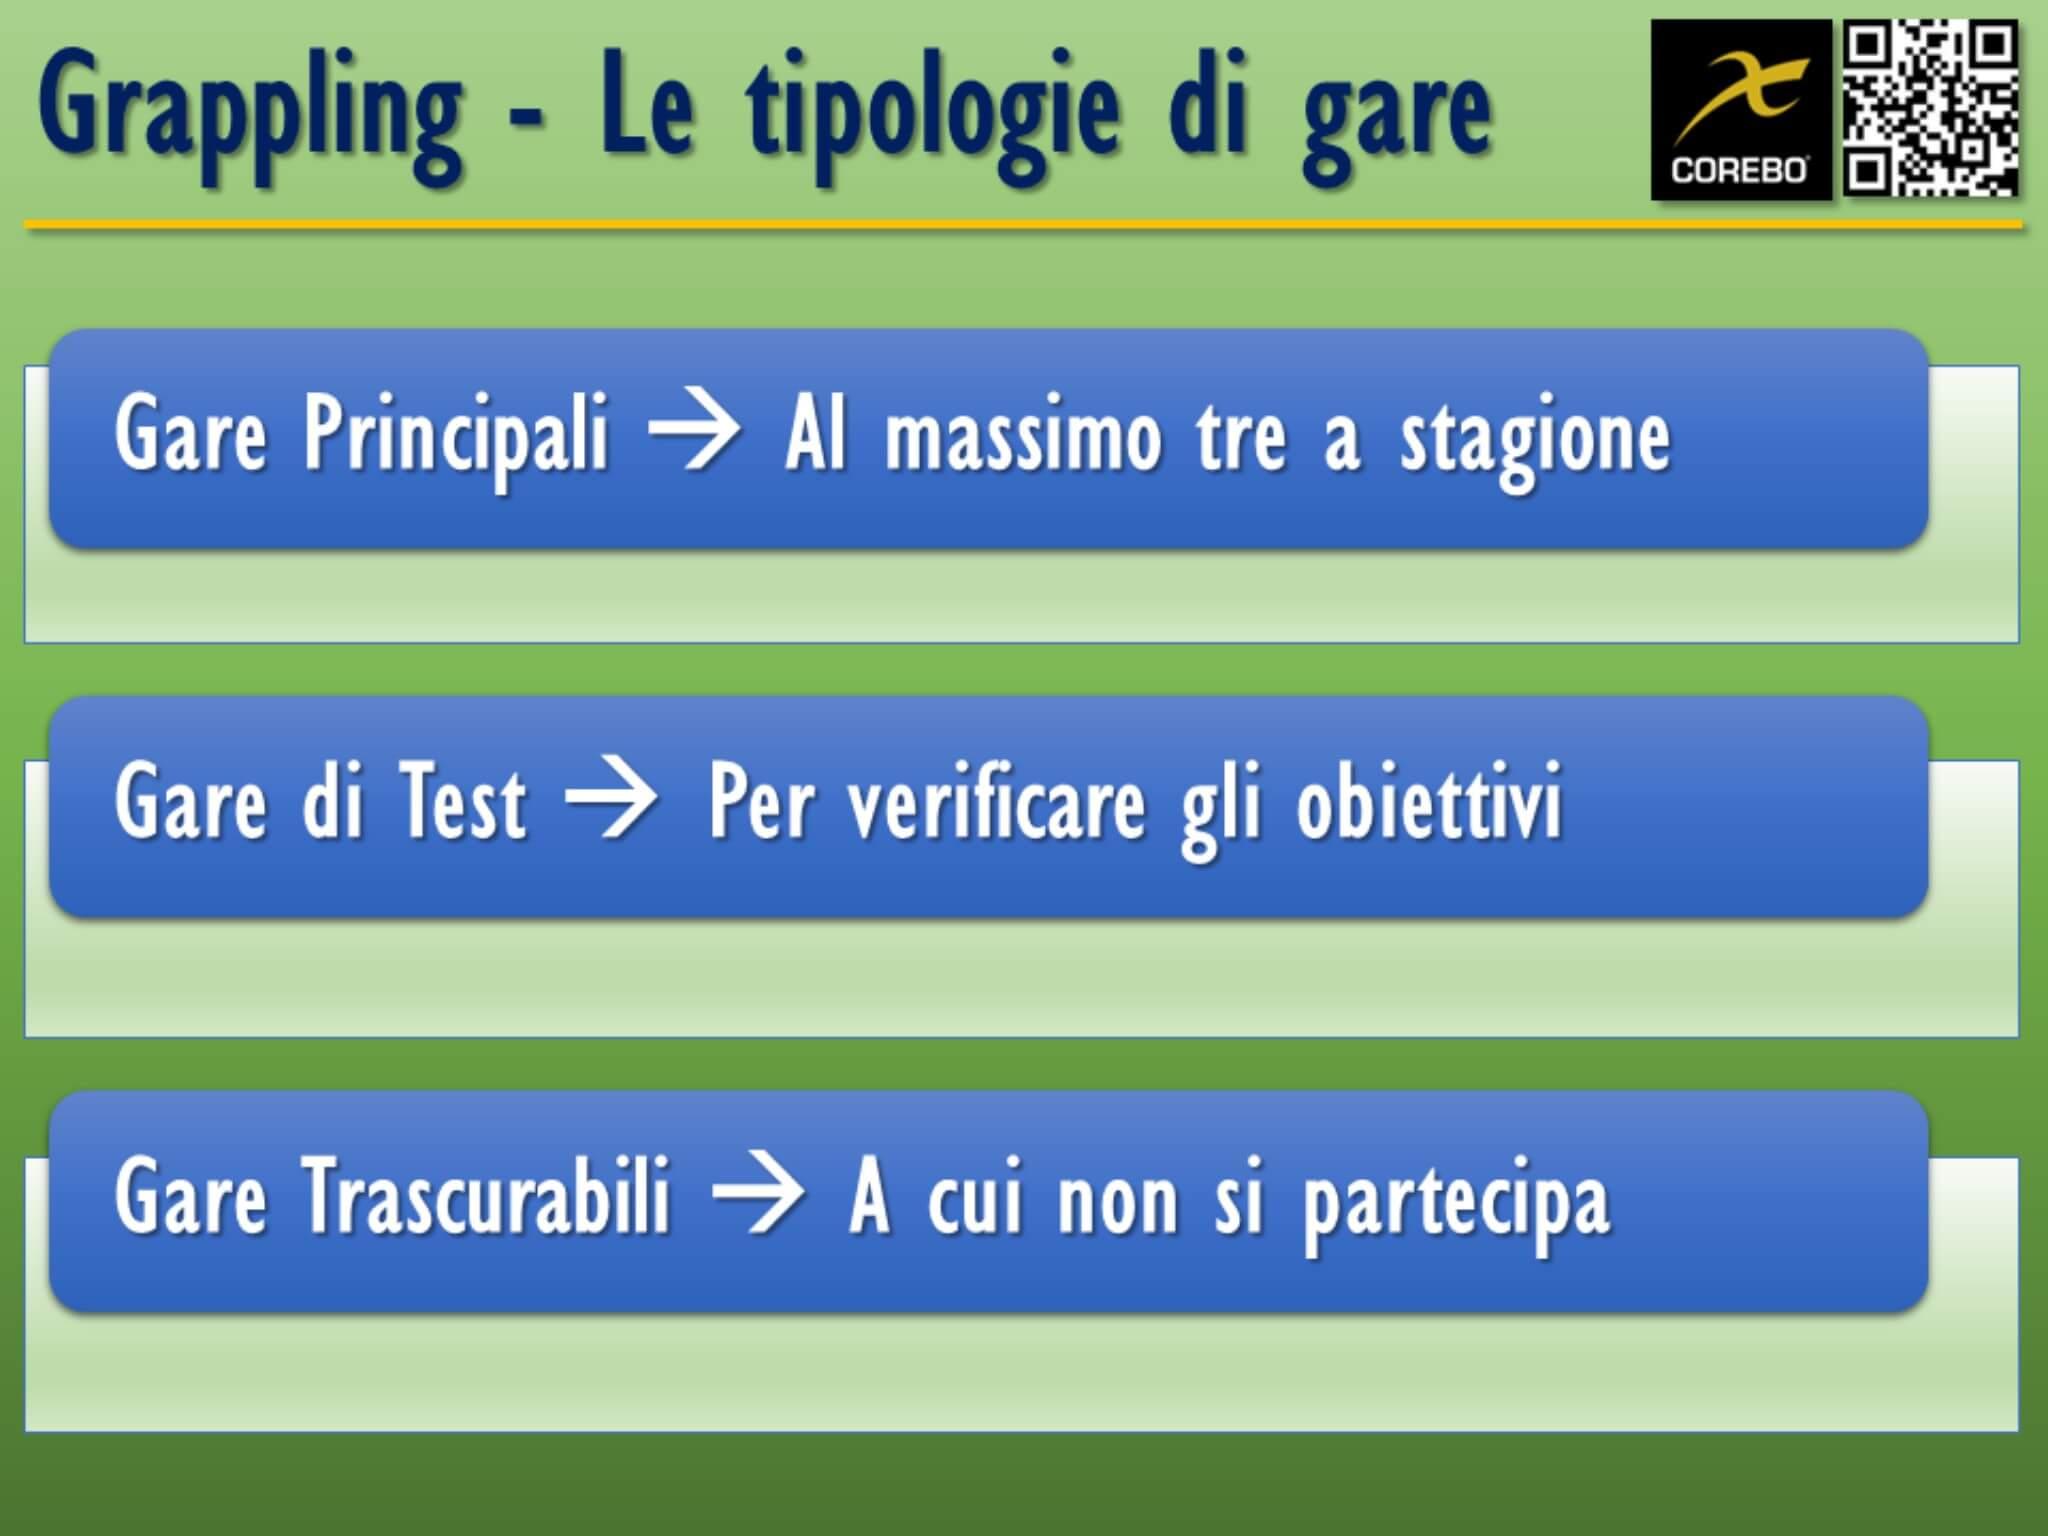 allenamento del grappling